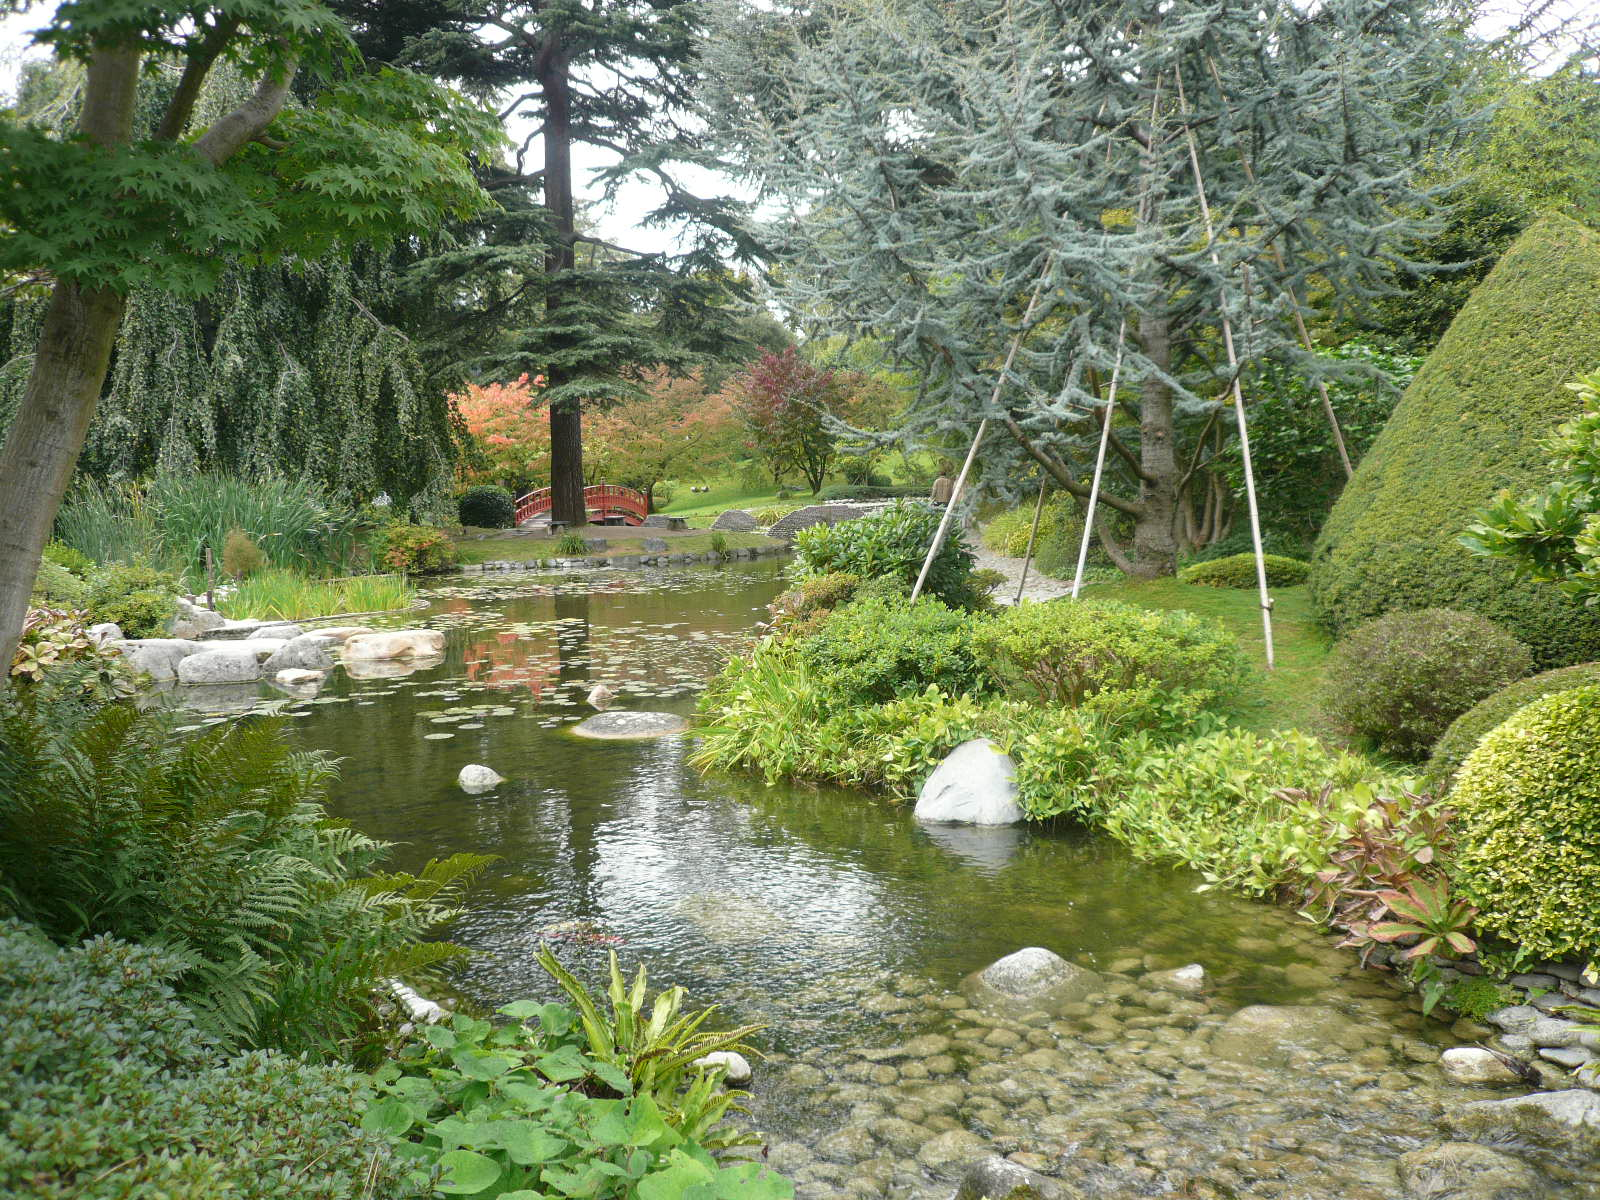 Déco Jardin Sauvage Auzielle 19 Villeurbanne Jardin Henri